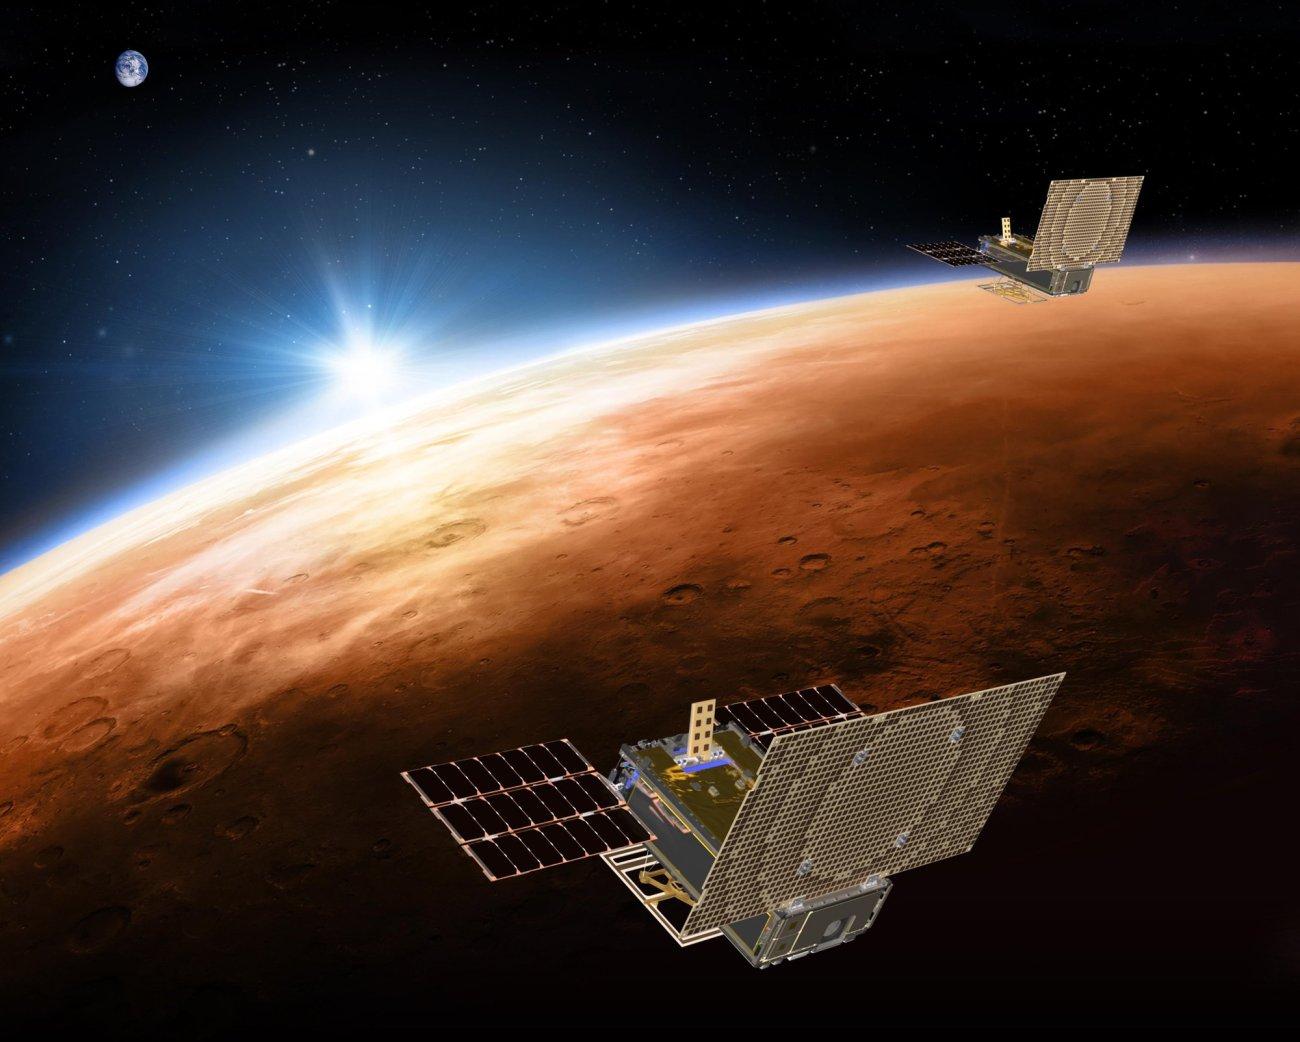 tiny satellites trailing Mars lander- AP